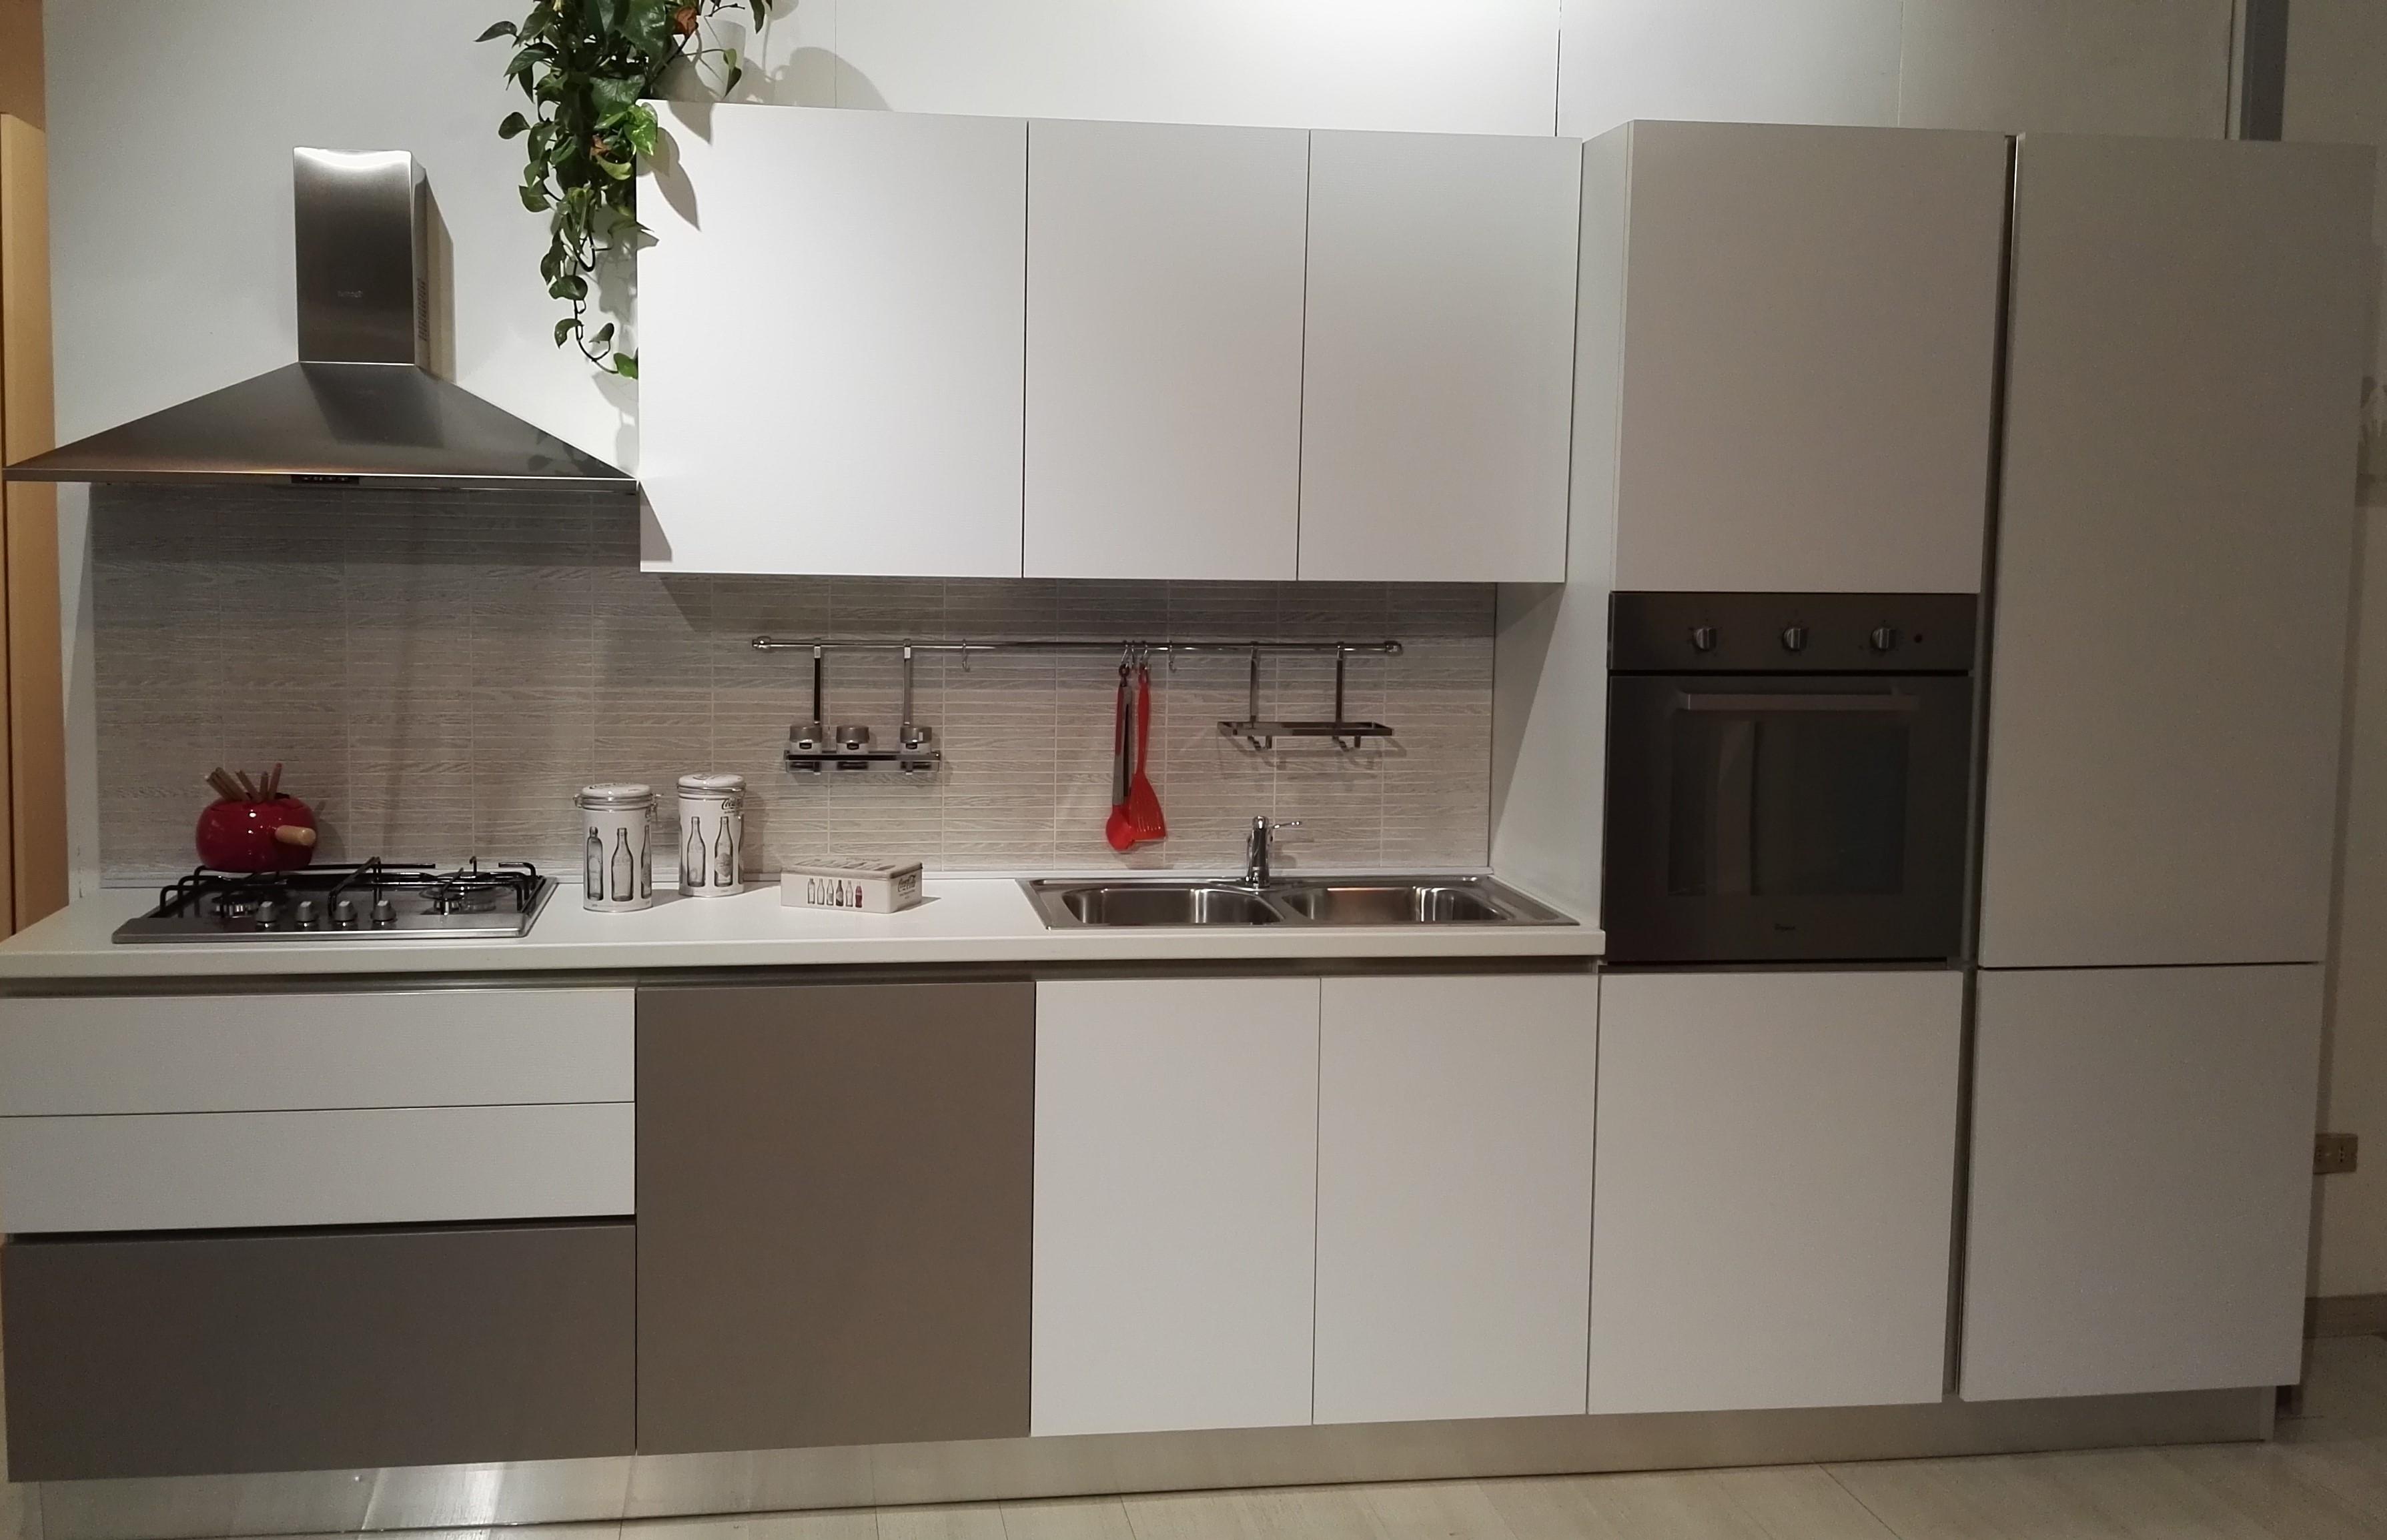 Cucina cm 360, SCONTATISSIMA pronta consegna - Cucine a prezzi ...